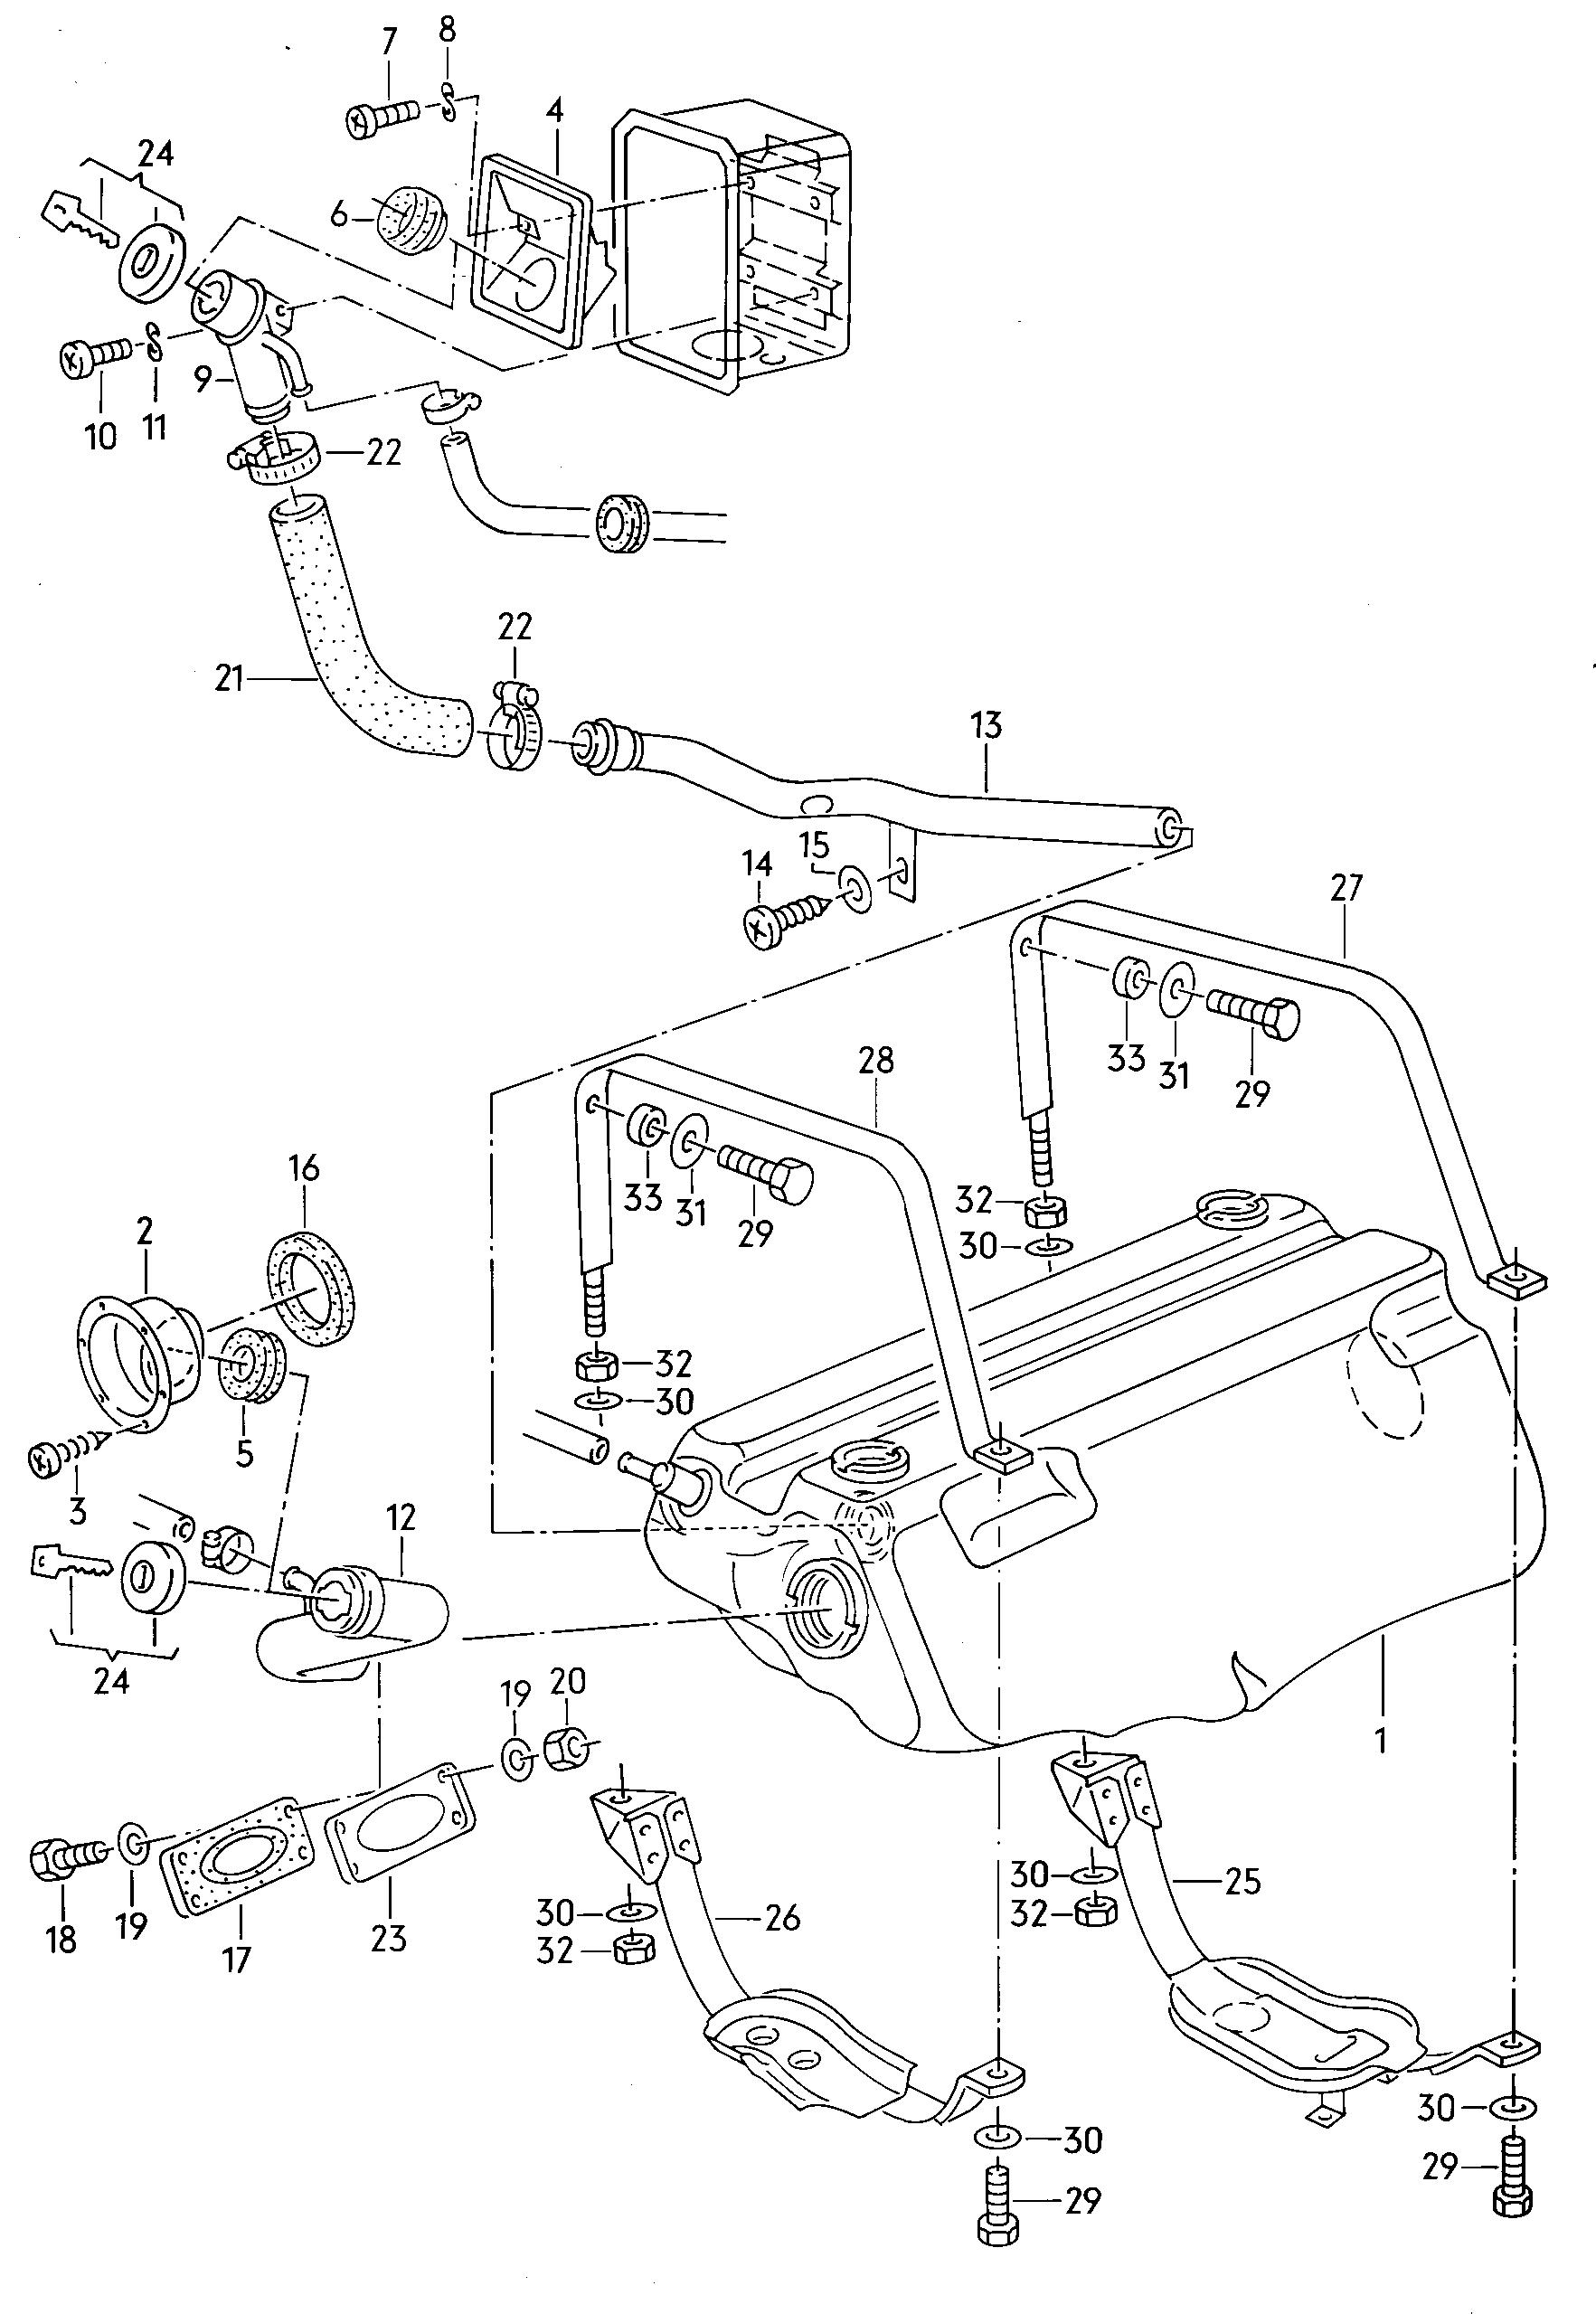 fuel tank  fuel filler neck  volkswagen vanagon syncro (1986 - 1992) / vag  etka